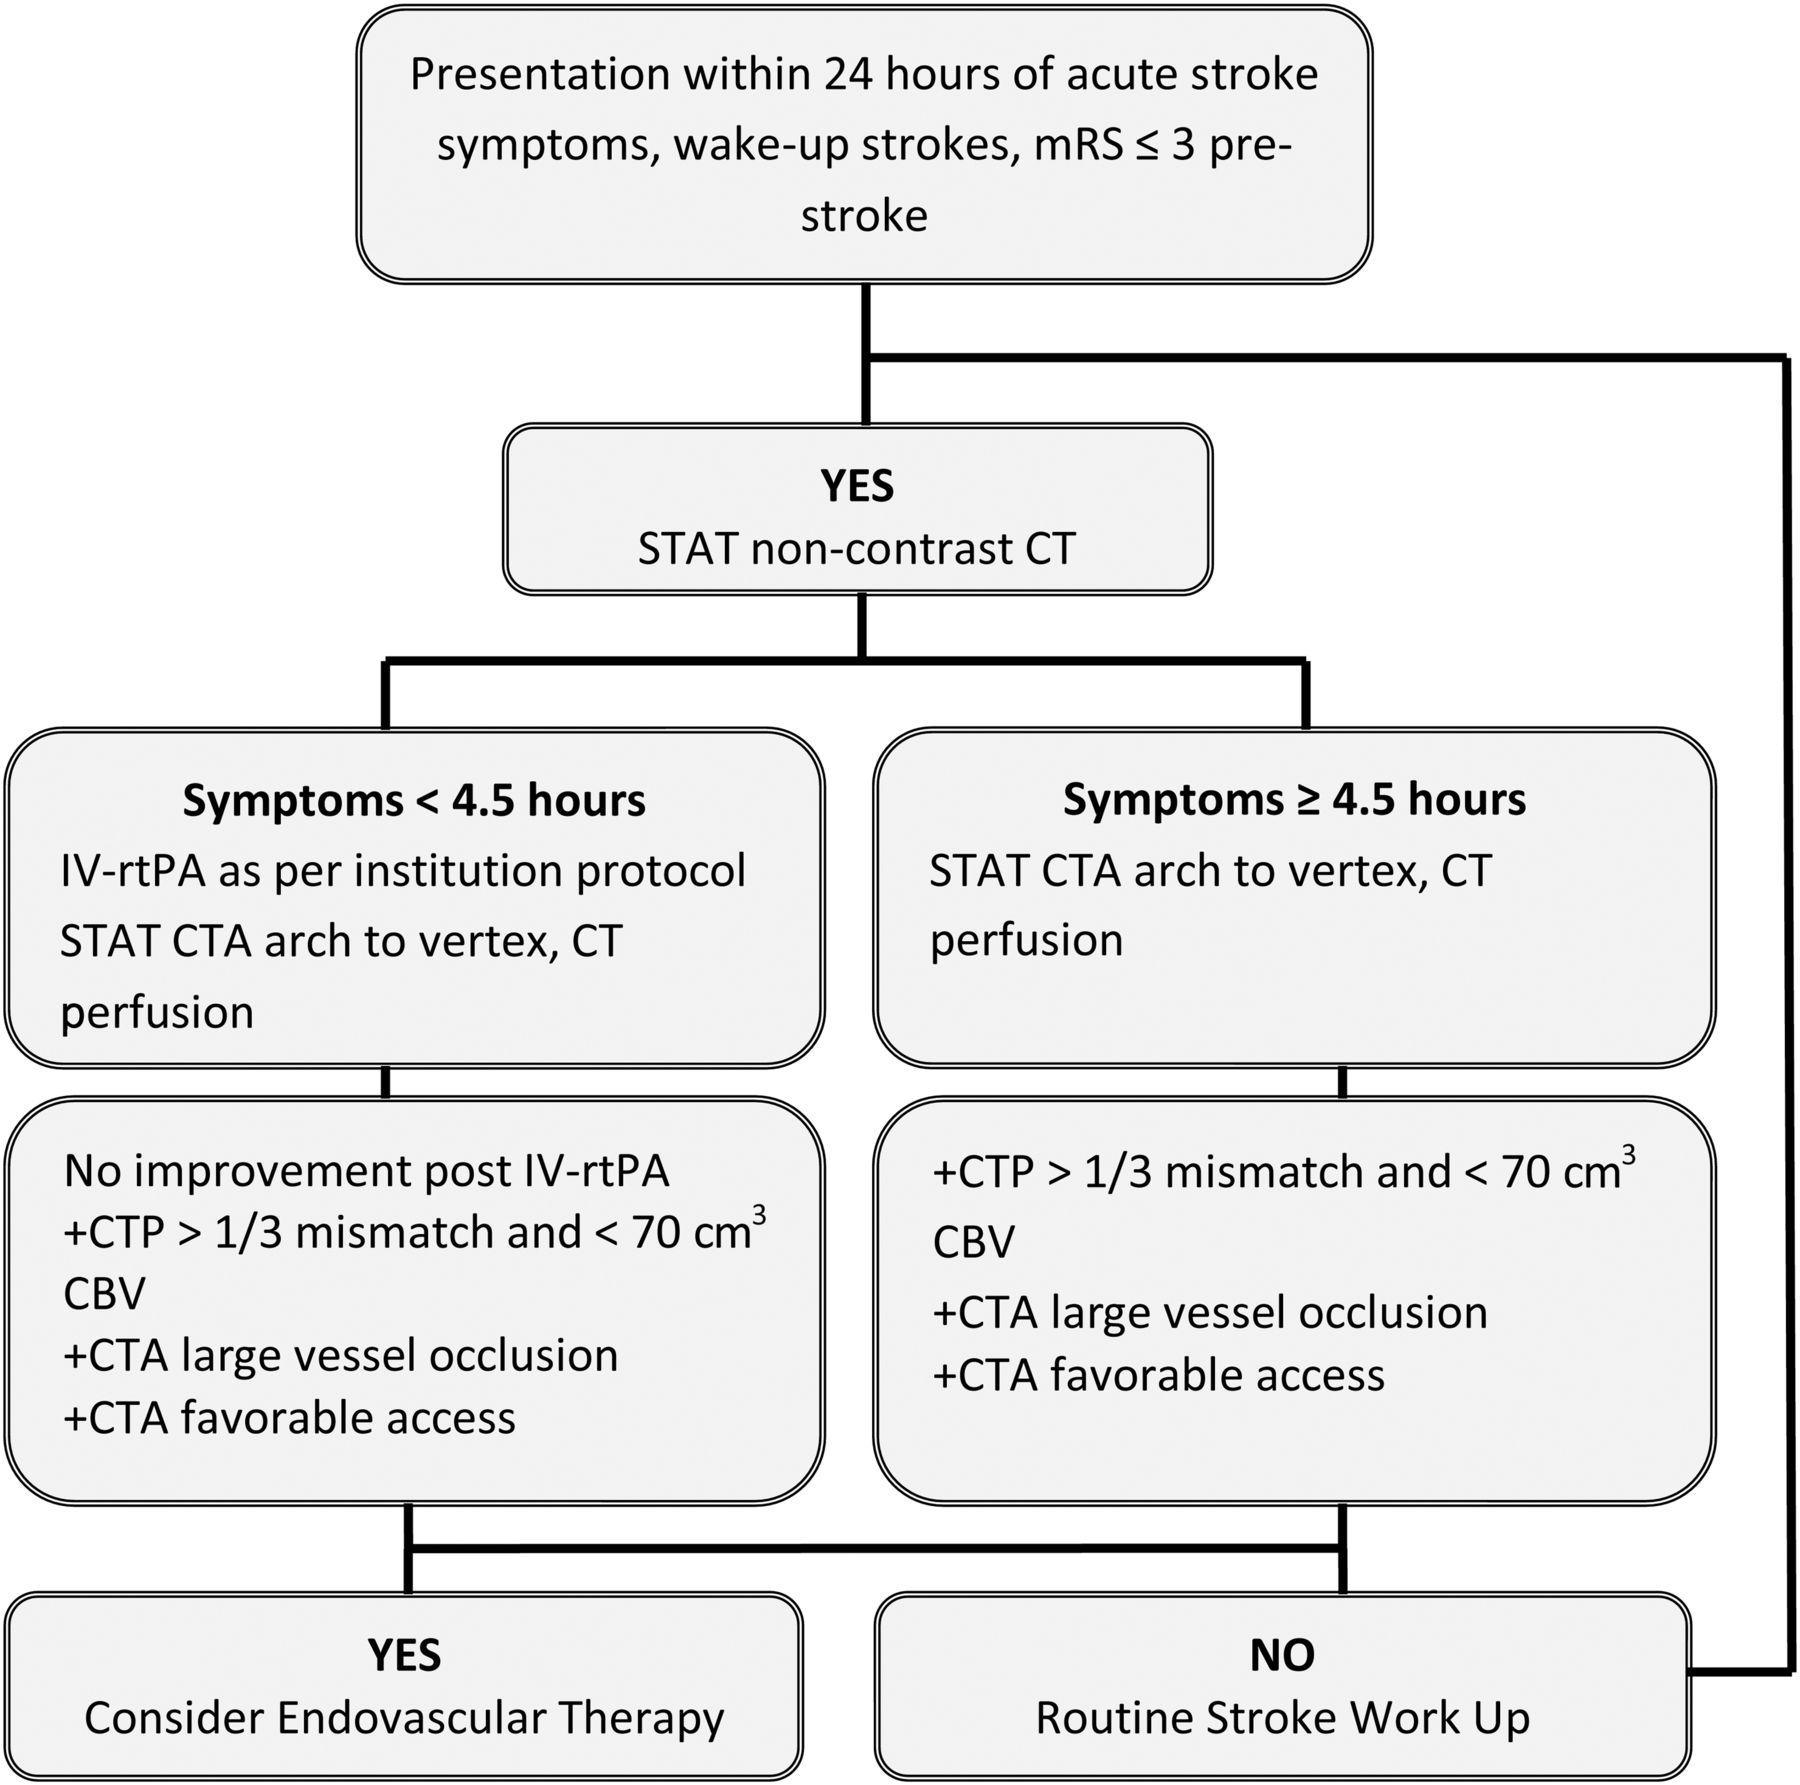 Application of acute stroke imaging